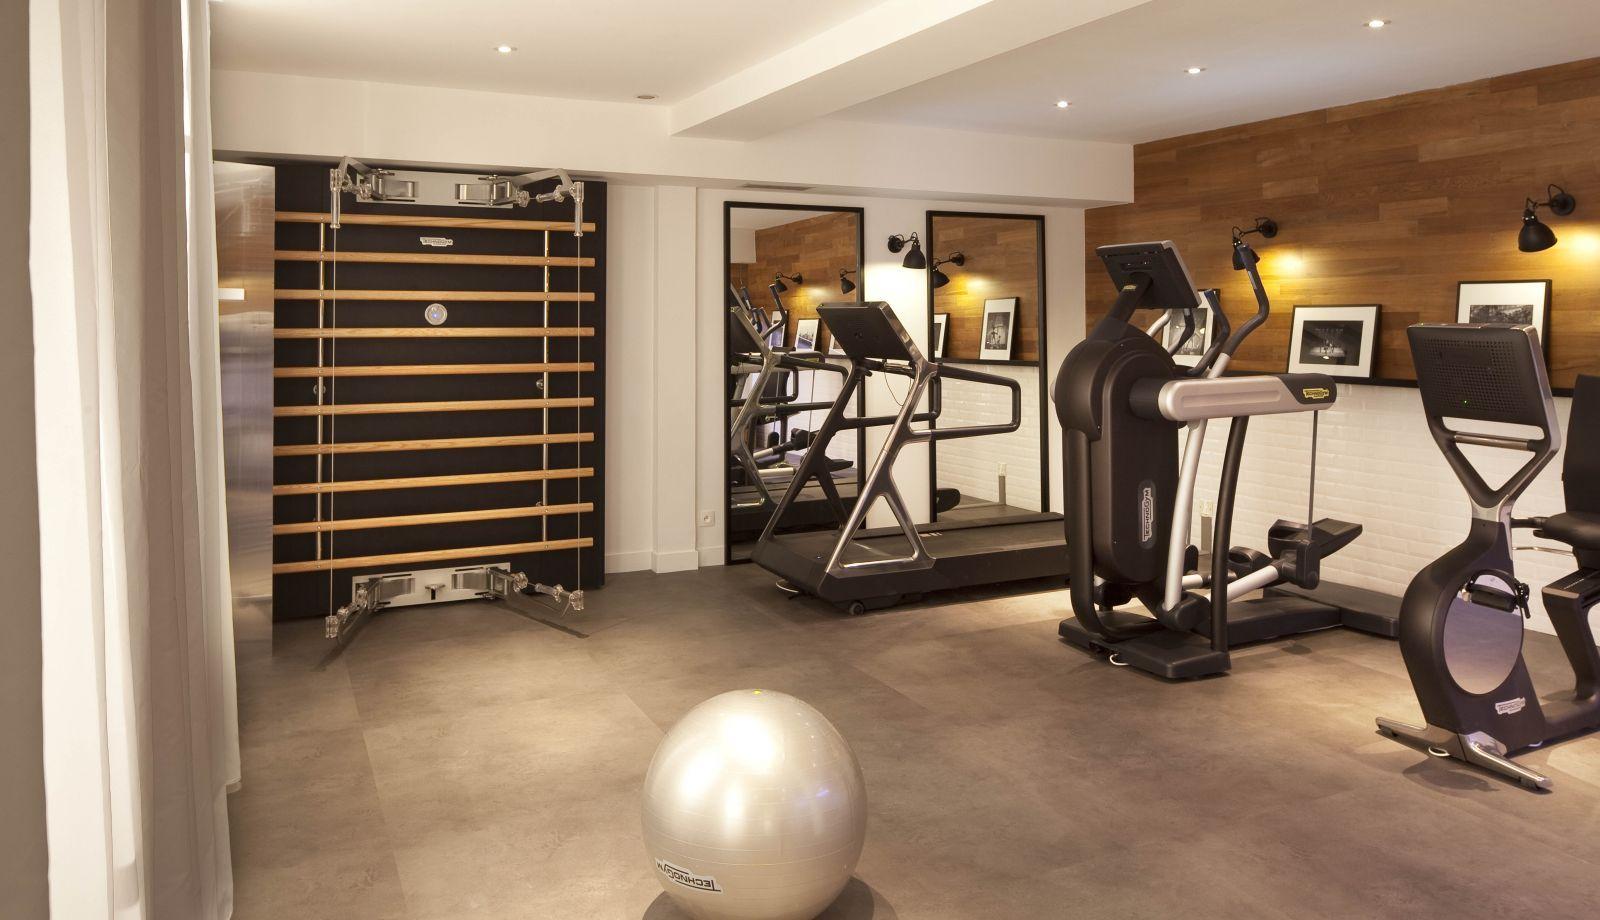 Official Site Saint Germain Des Pres Paris Home Gym Decor Home Gym Design Hotel Design